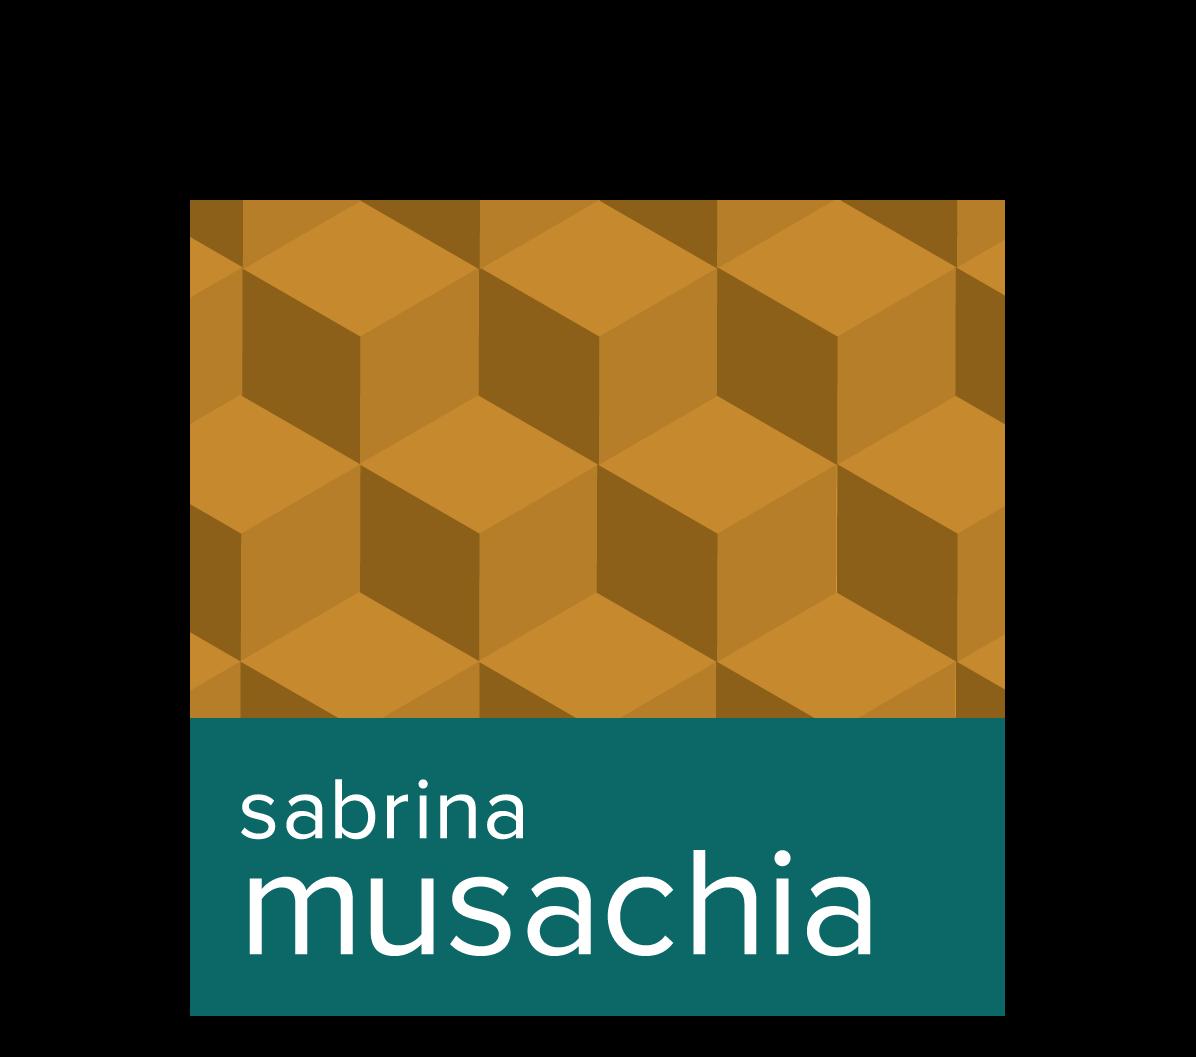 Sabrina Musachia